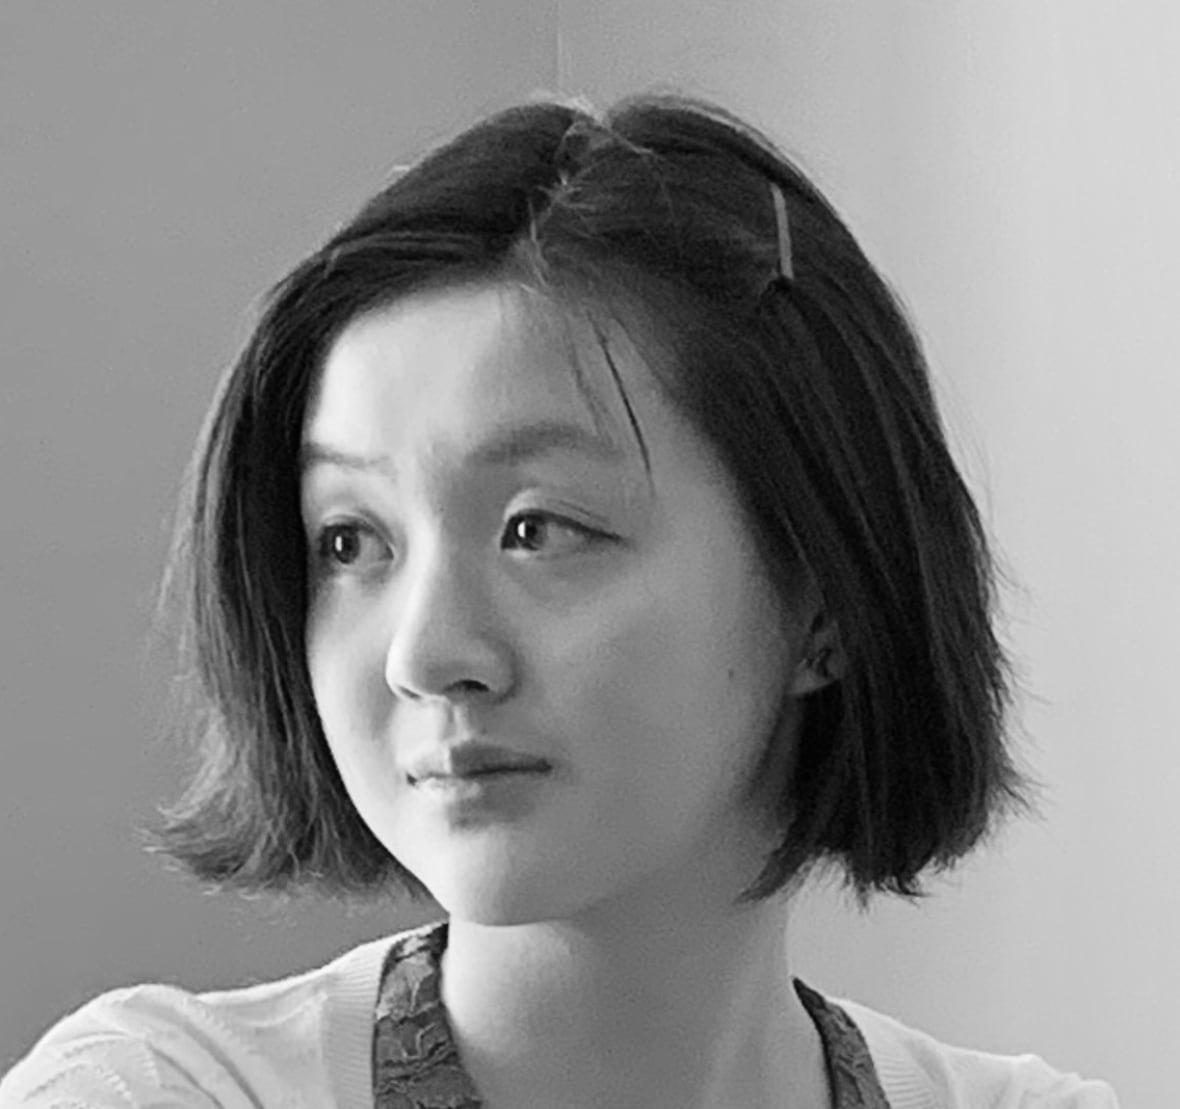 Jessica Yuma